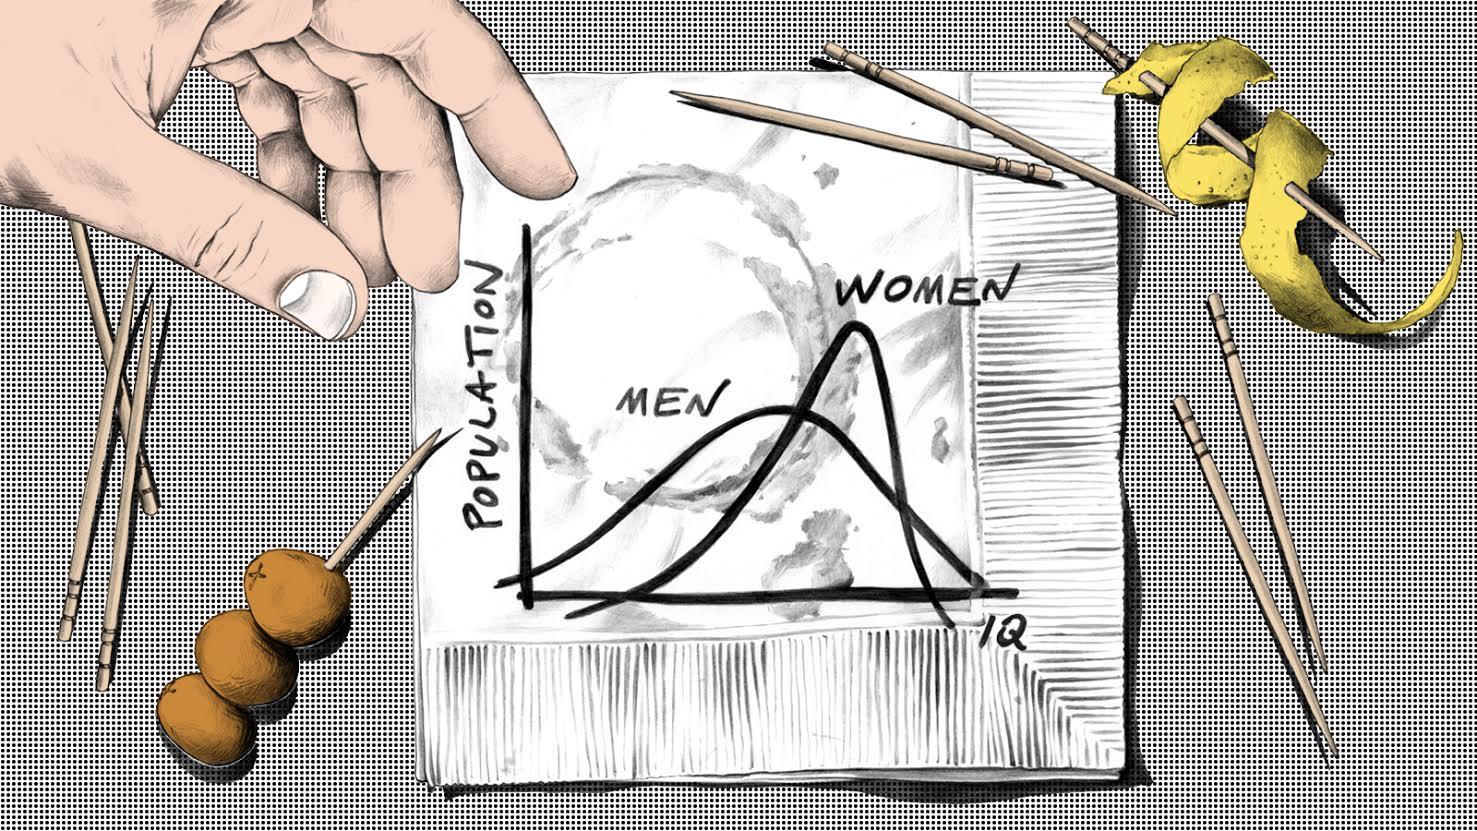 menwomenintelligencedistribution